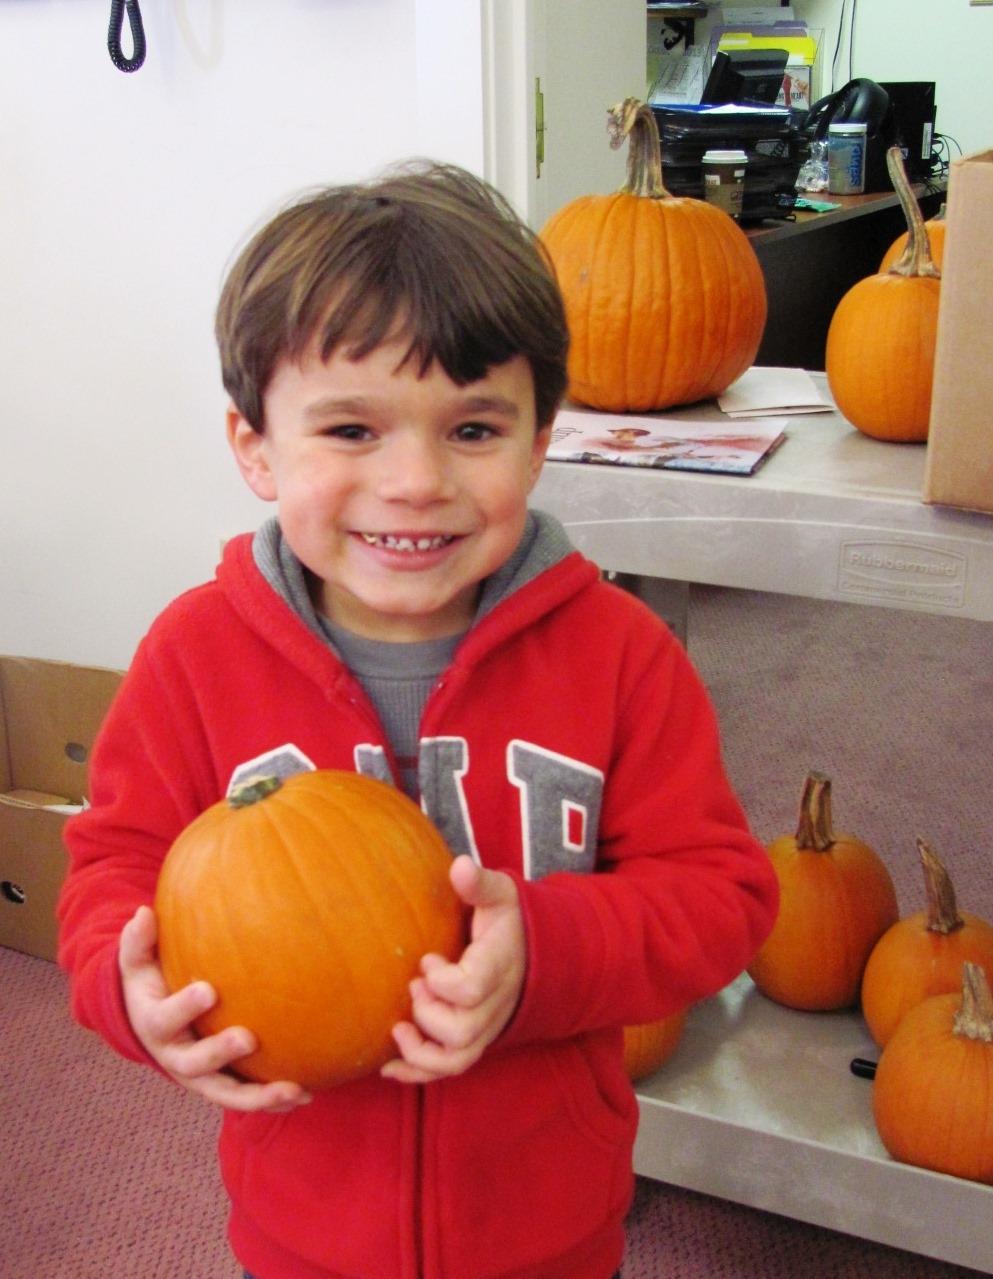 Adian_Medeiros_with_pumpkin.jpg